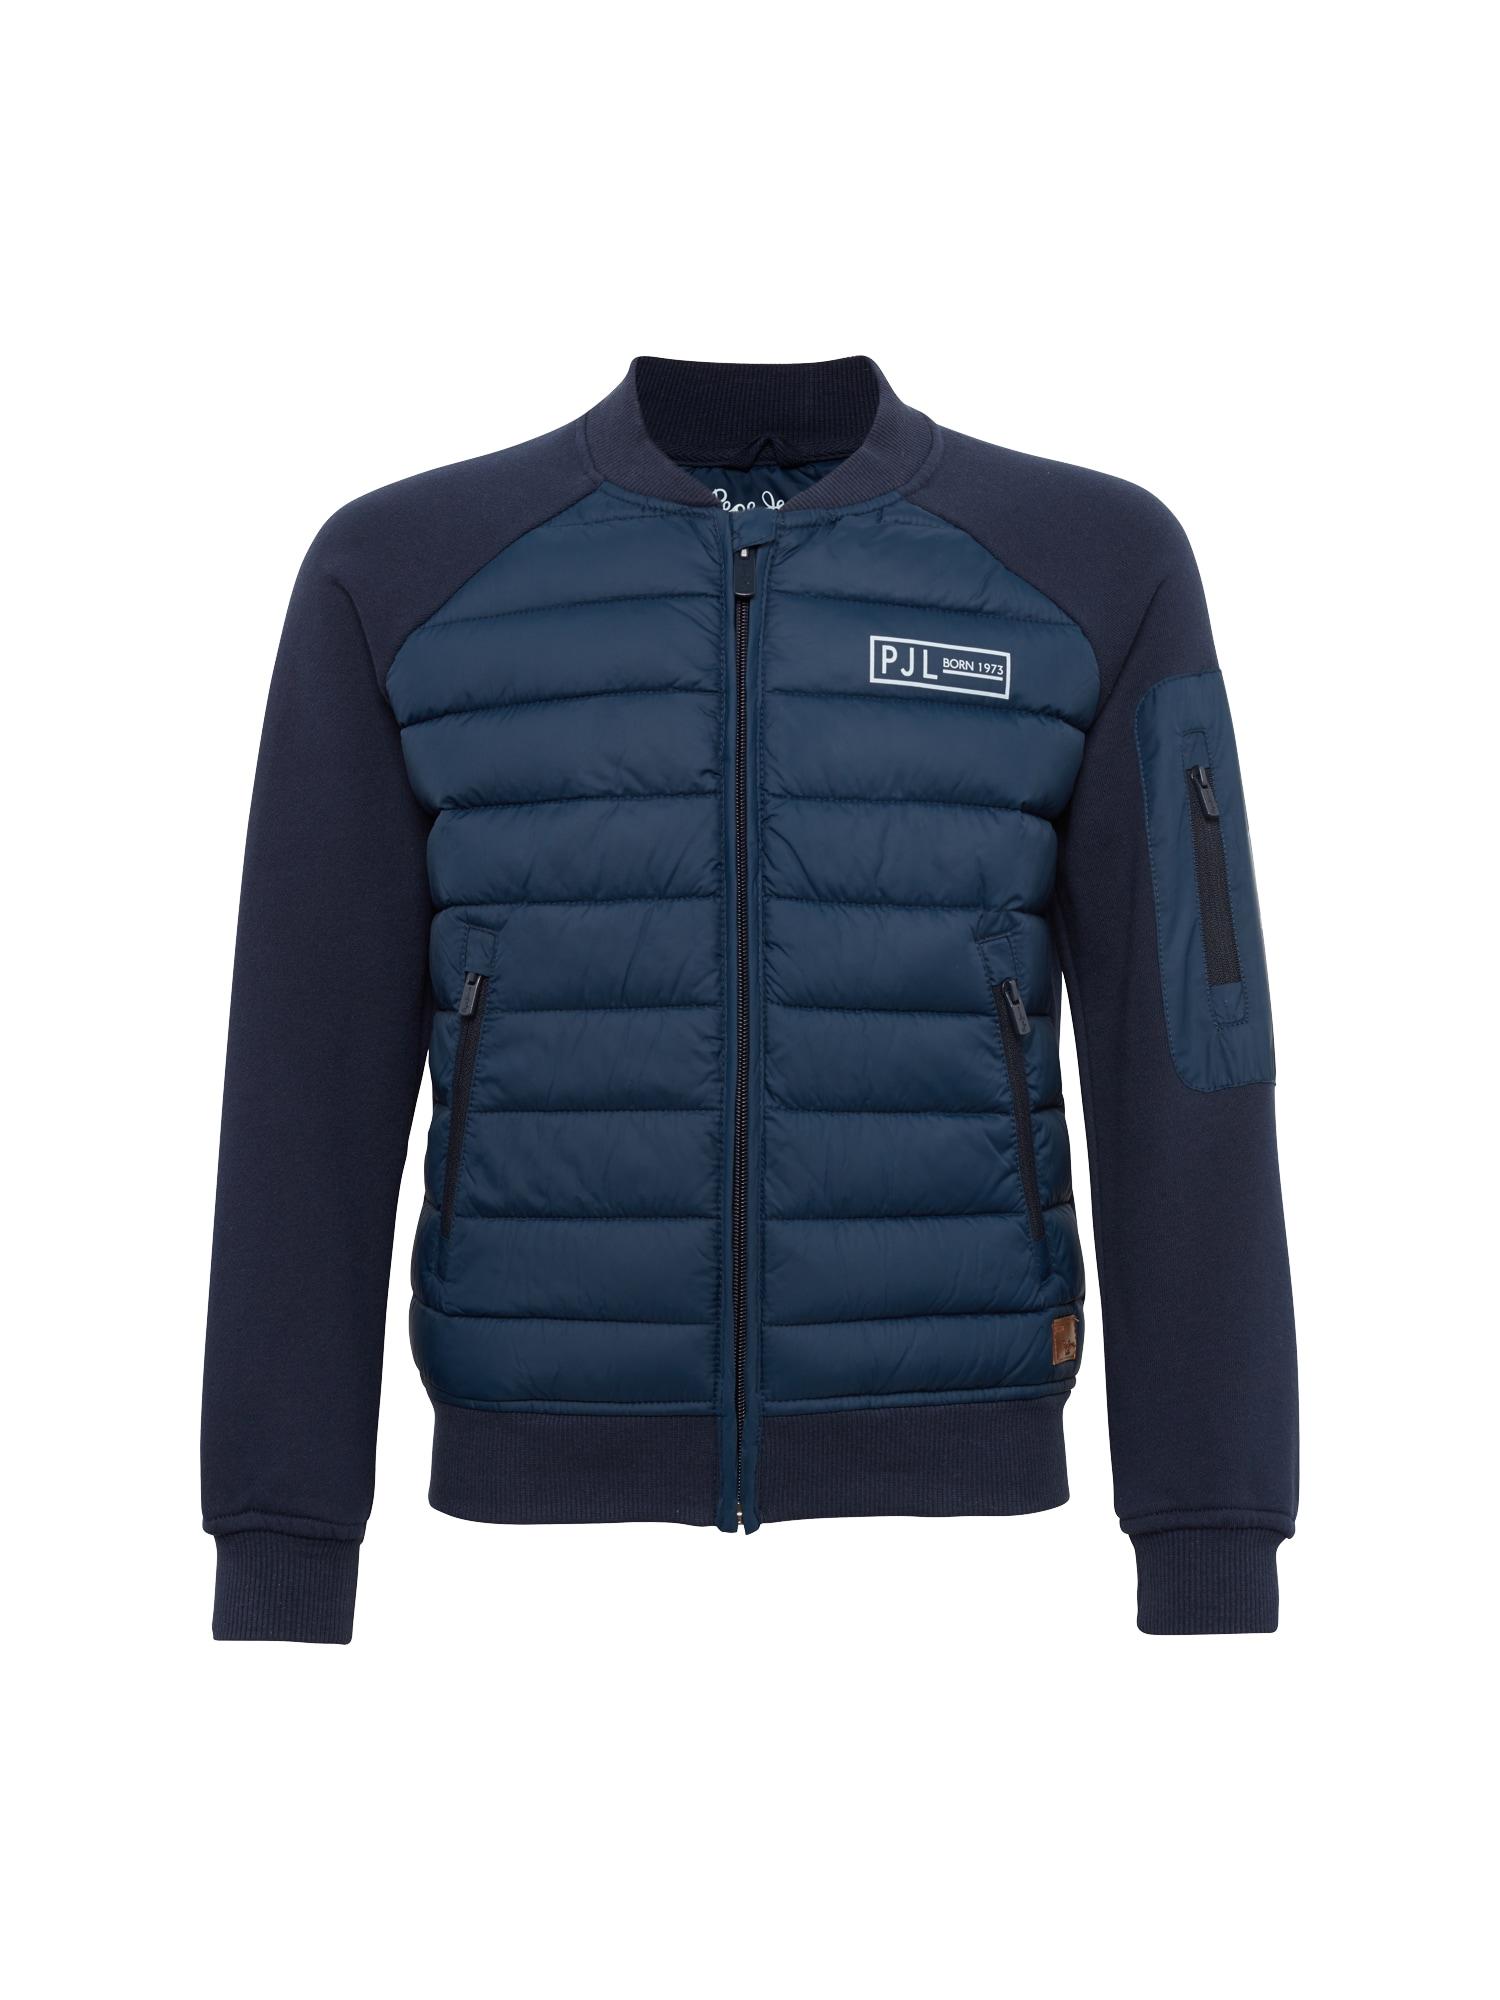 Pepe Jeans Jongens Sweatshirt SAULO JR donkerblauw